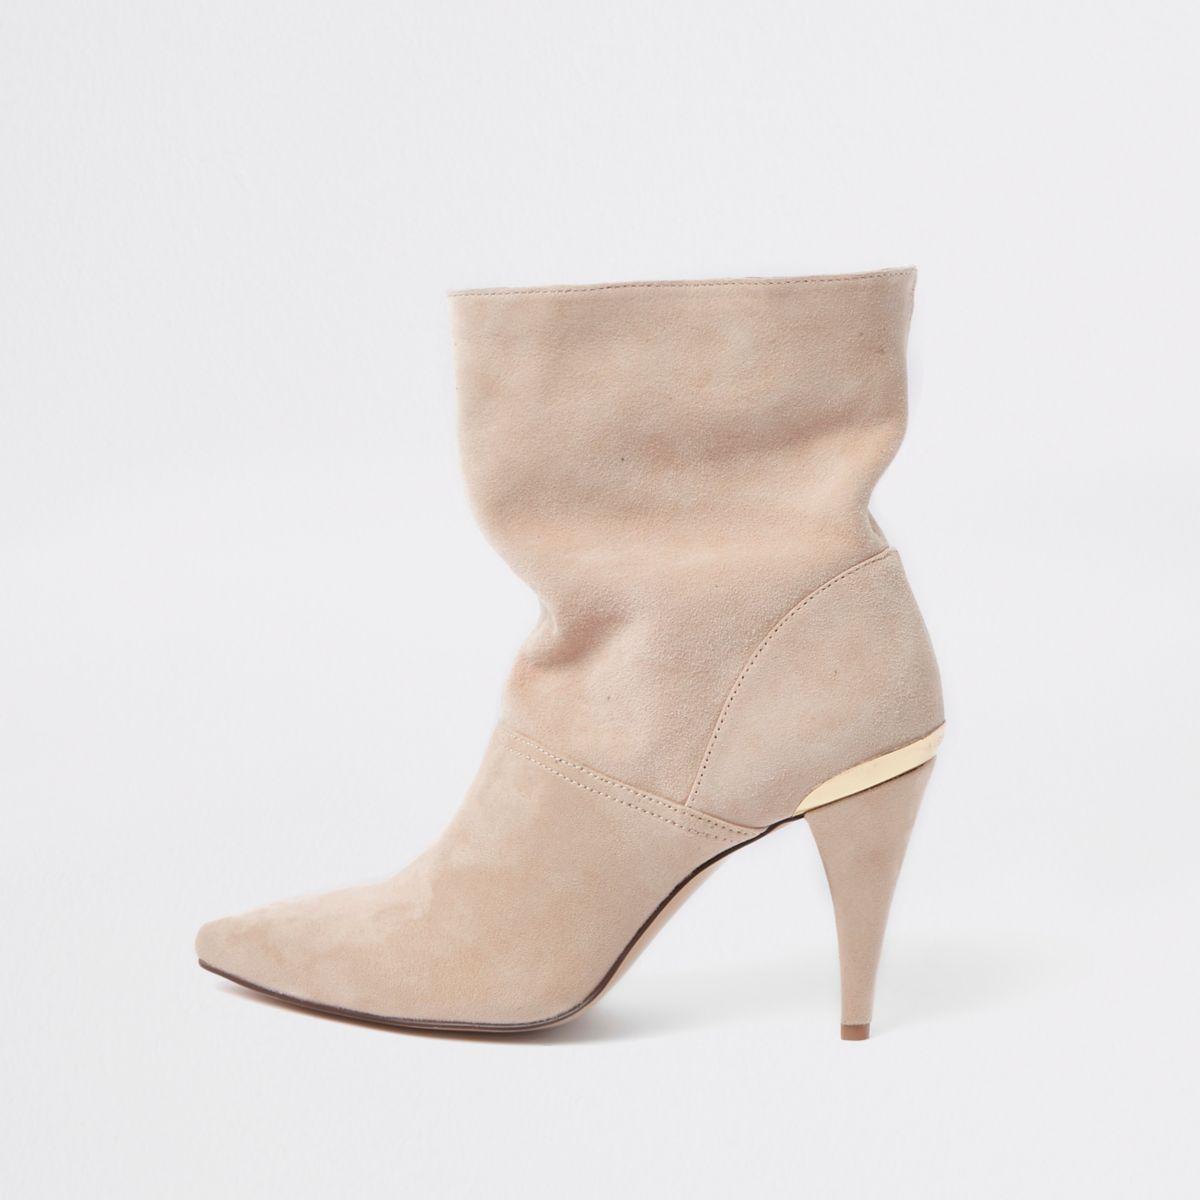 Cream suede slouch cone heel boots